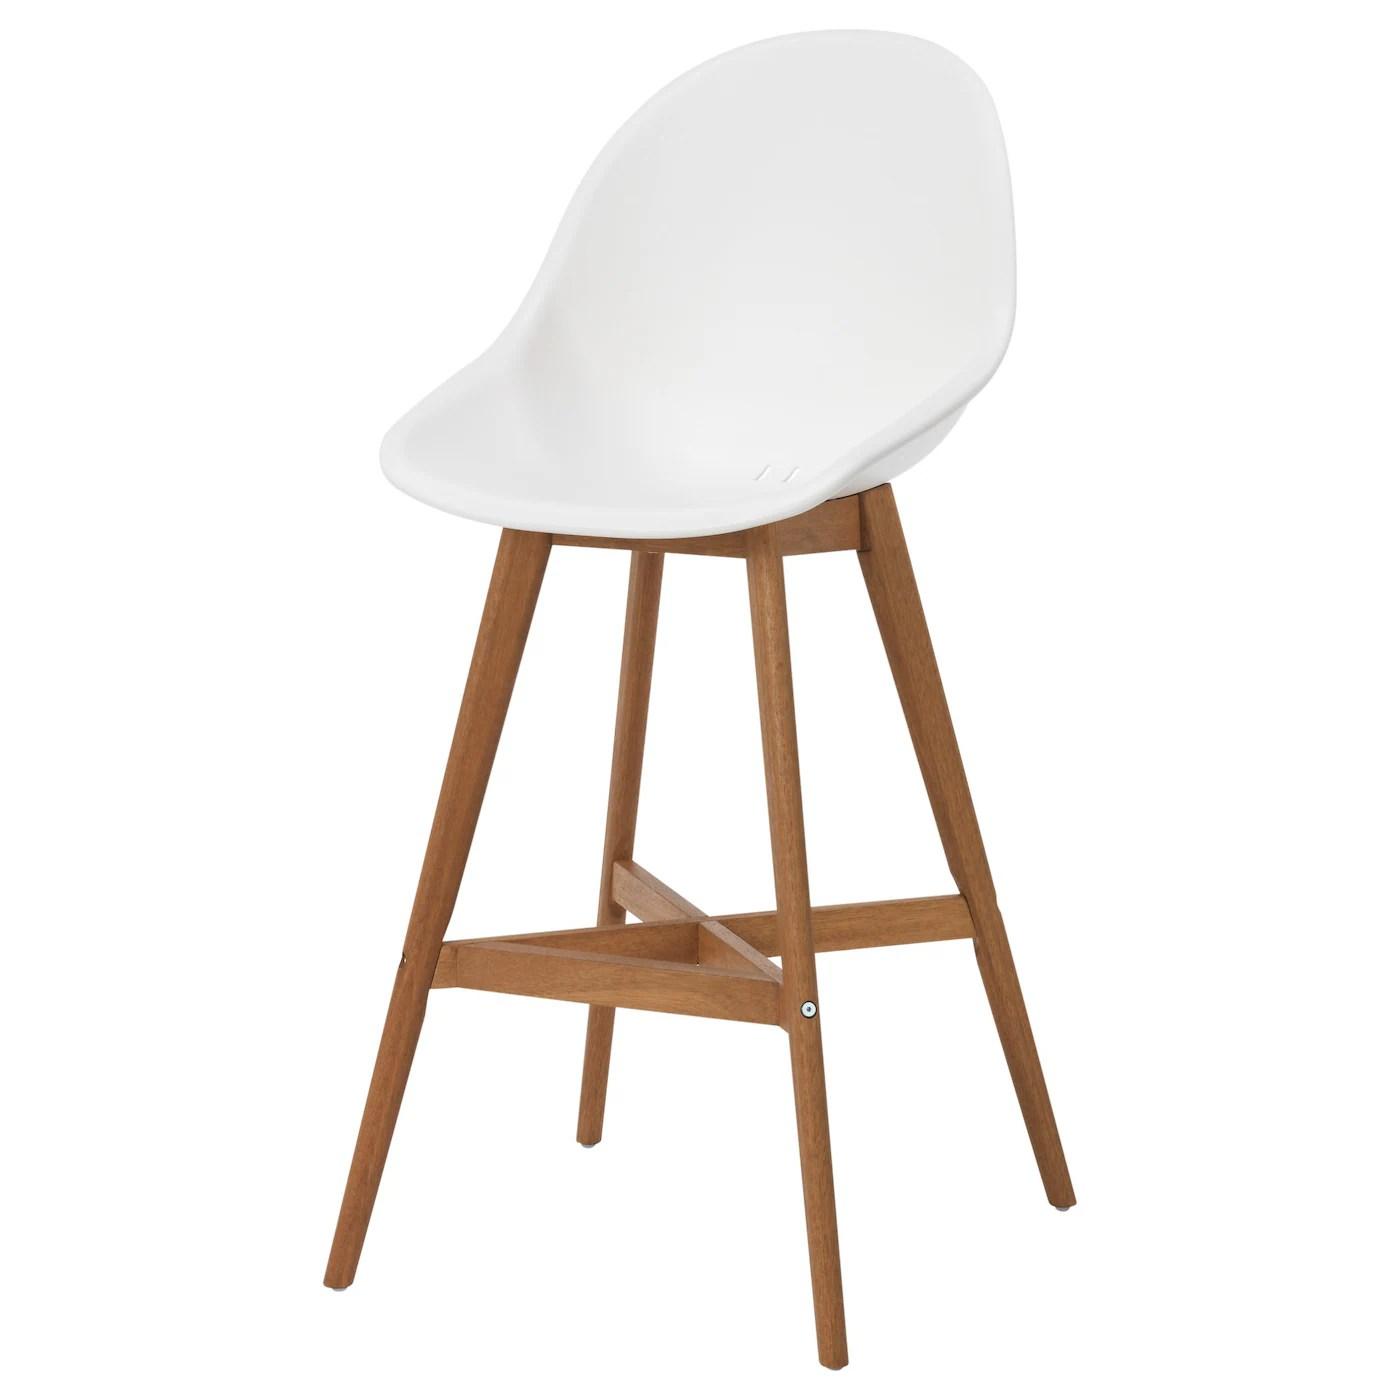 ikea bar chair black folding chairs fanbyn stool with backrest white 74 cm